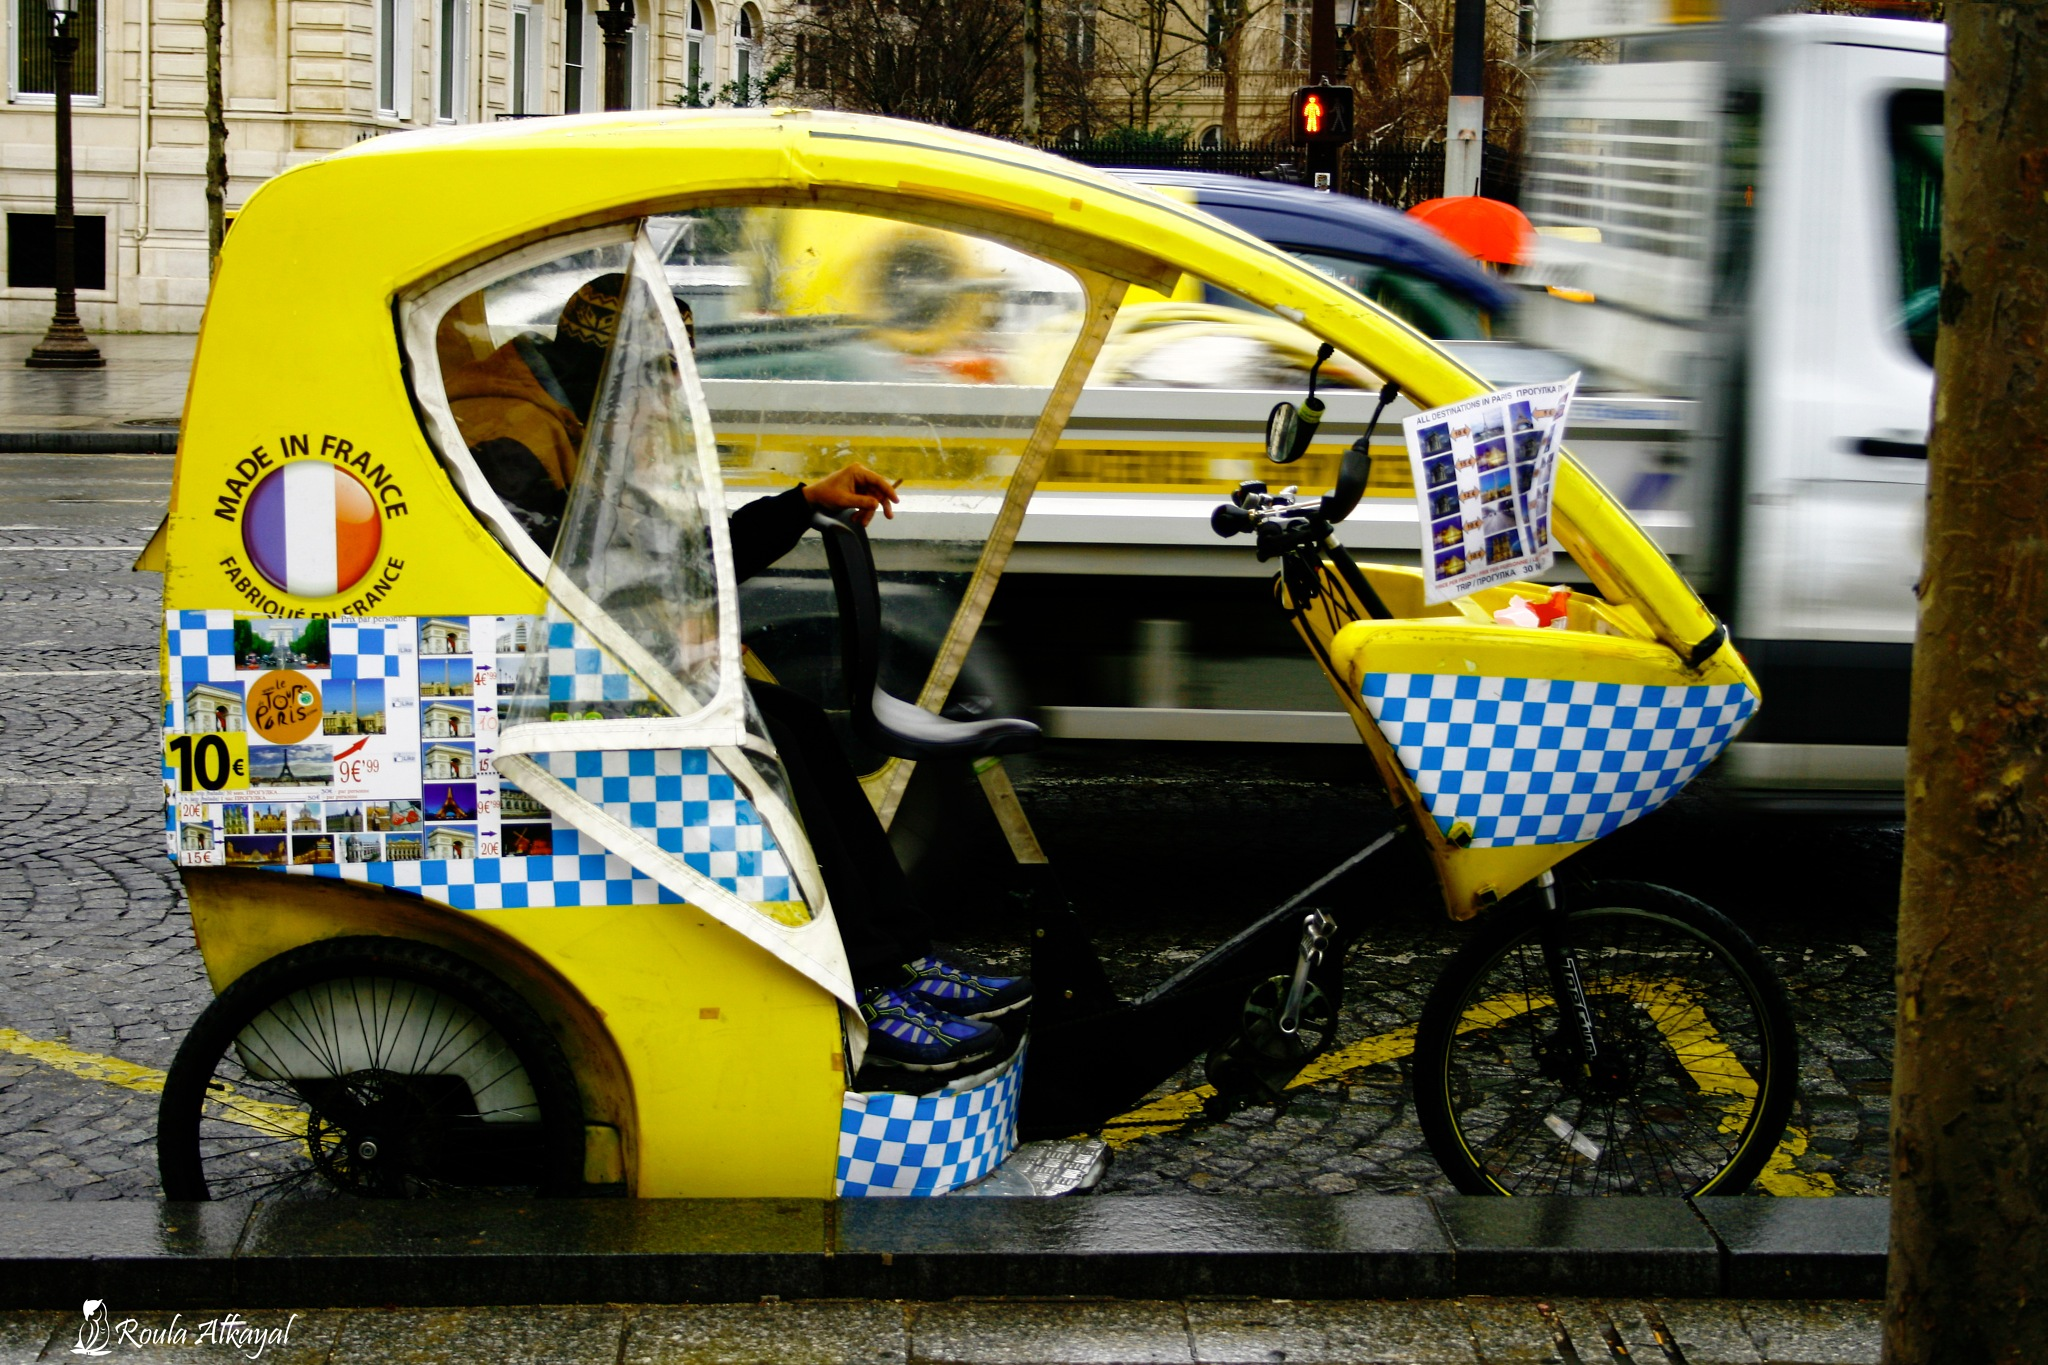 in Paris street  by Roula Kayal